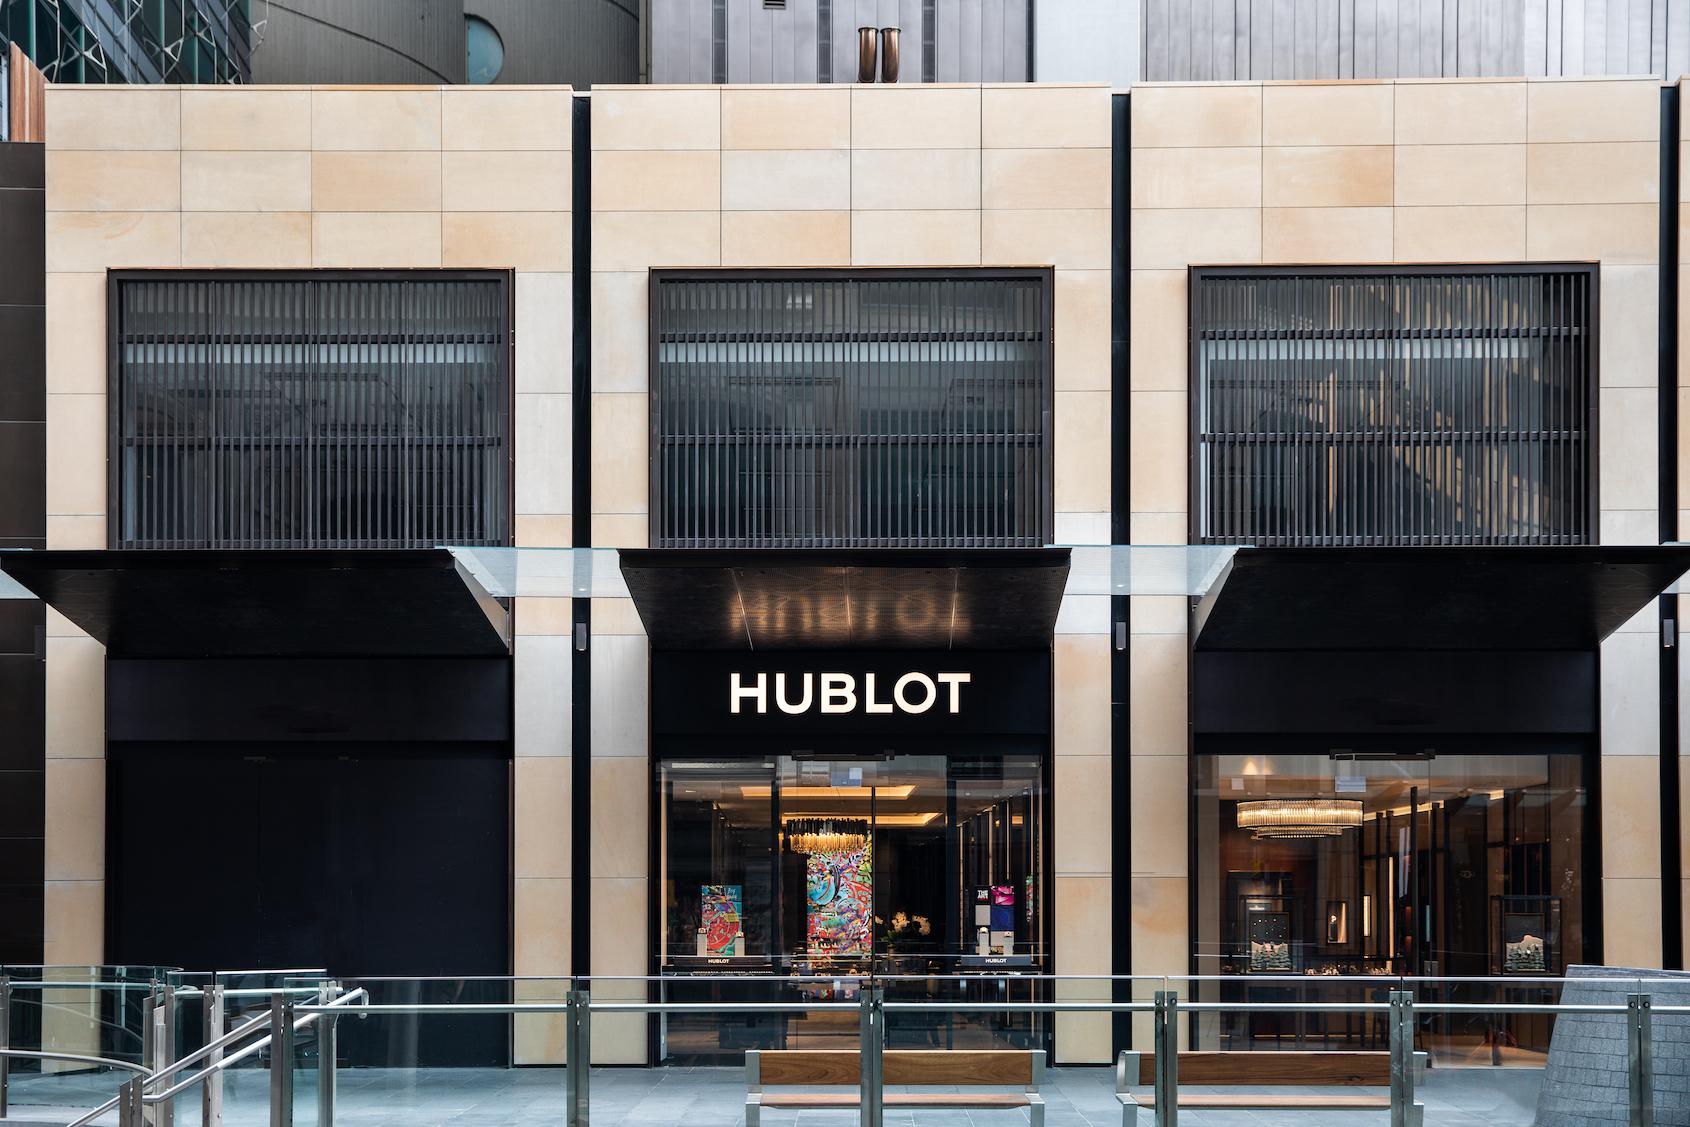 Hublot boutique in Sydney